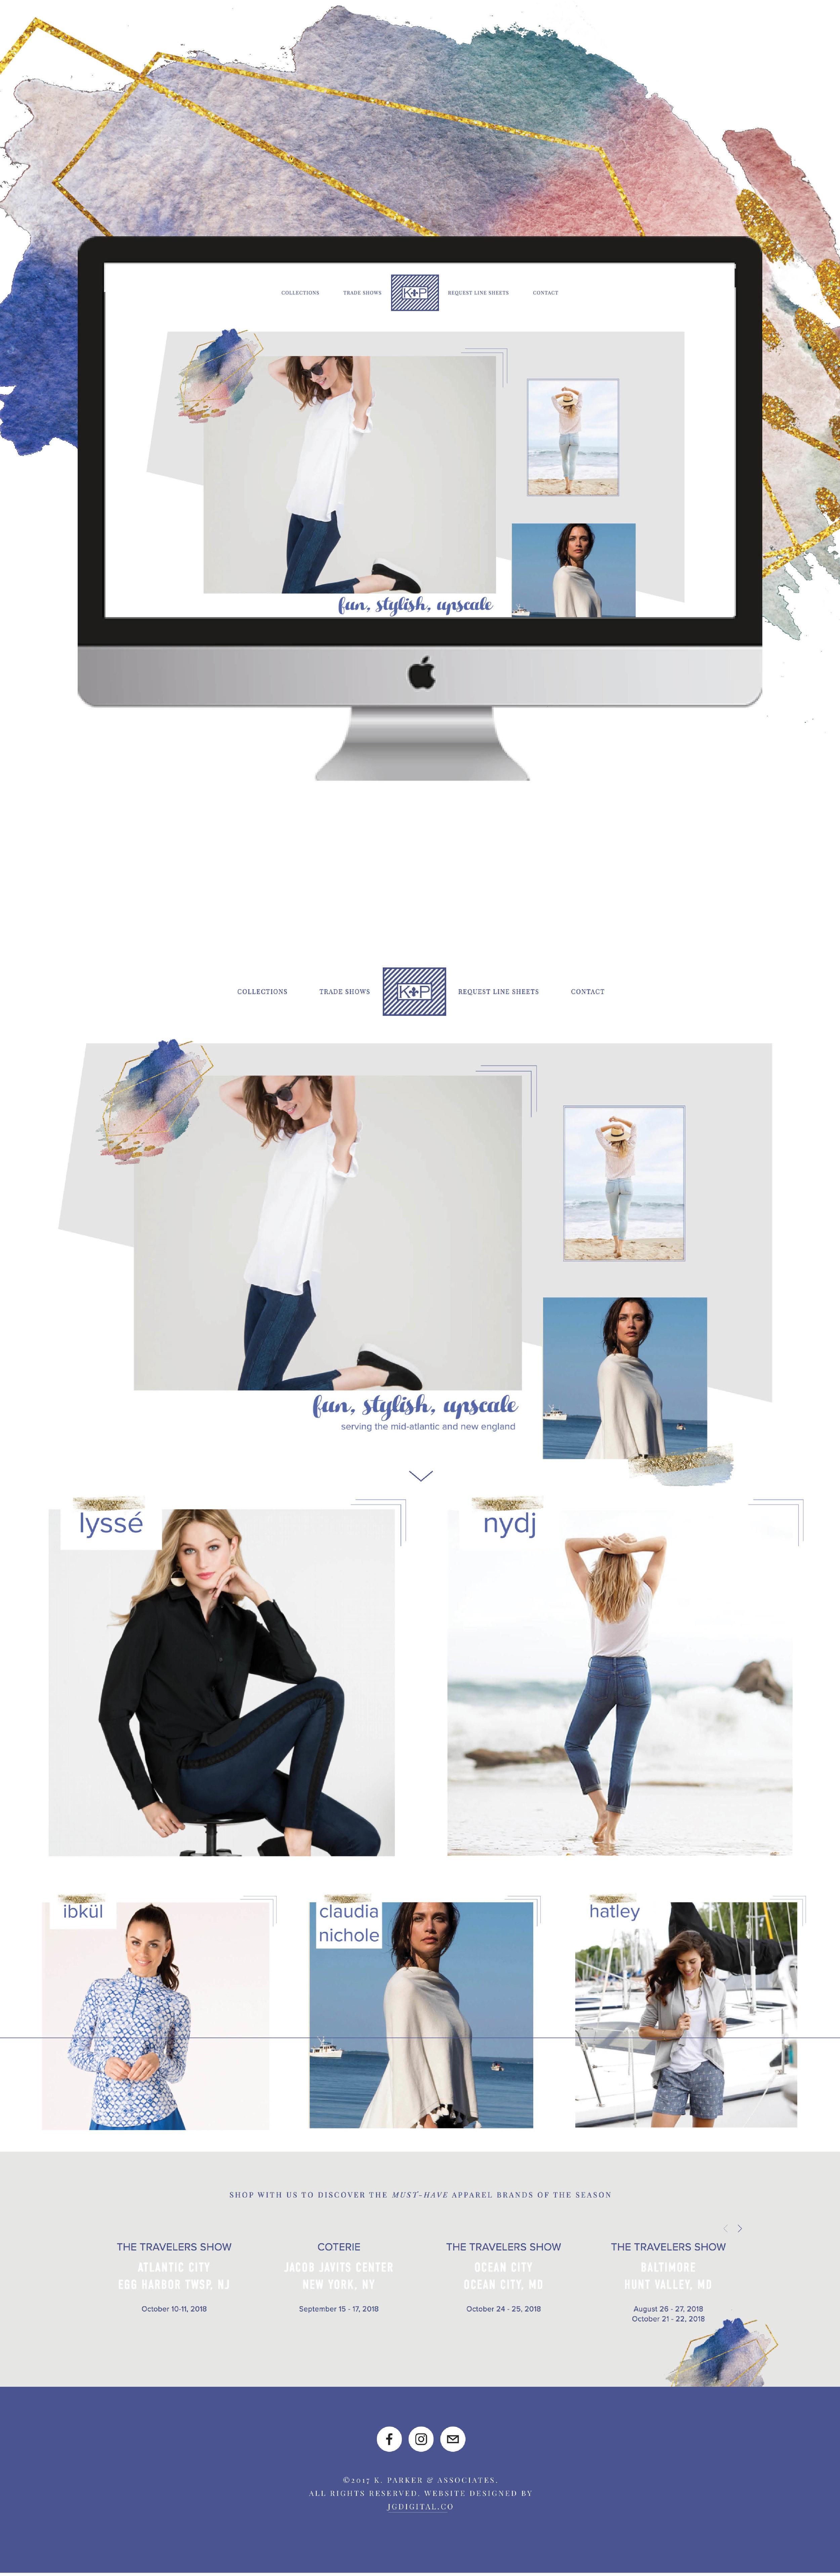 Fashion-Inspired Squarespace Website Design for K. Parker Associates by jgdigital.co